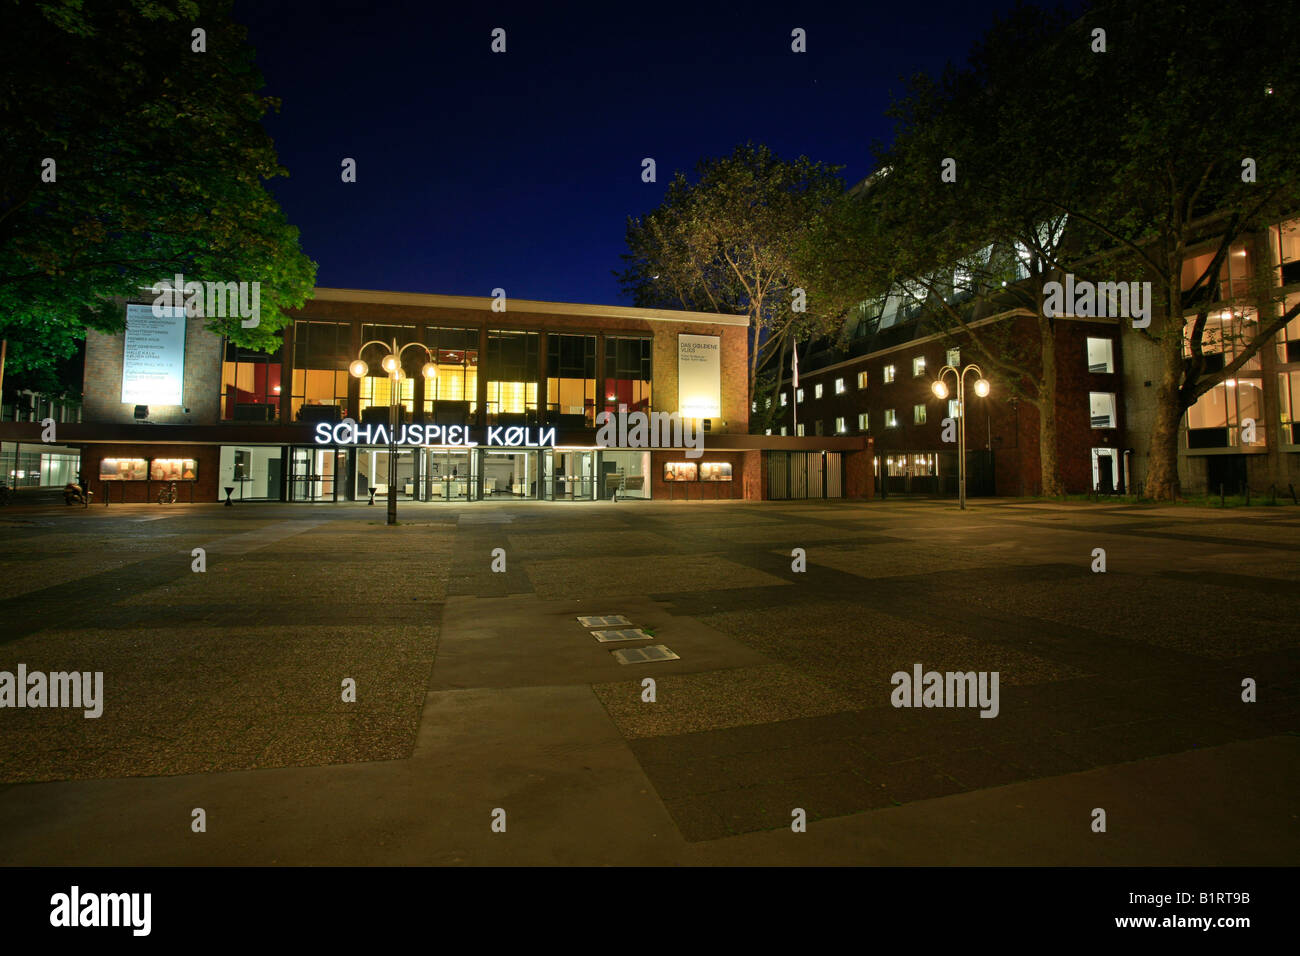 Schauspiel Koeln, Cologne Theatre, Offenbachplatz, Offenbach Square, Cologne, North Rhine-Westphalia, Germany, Europe - Stock Image